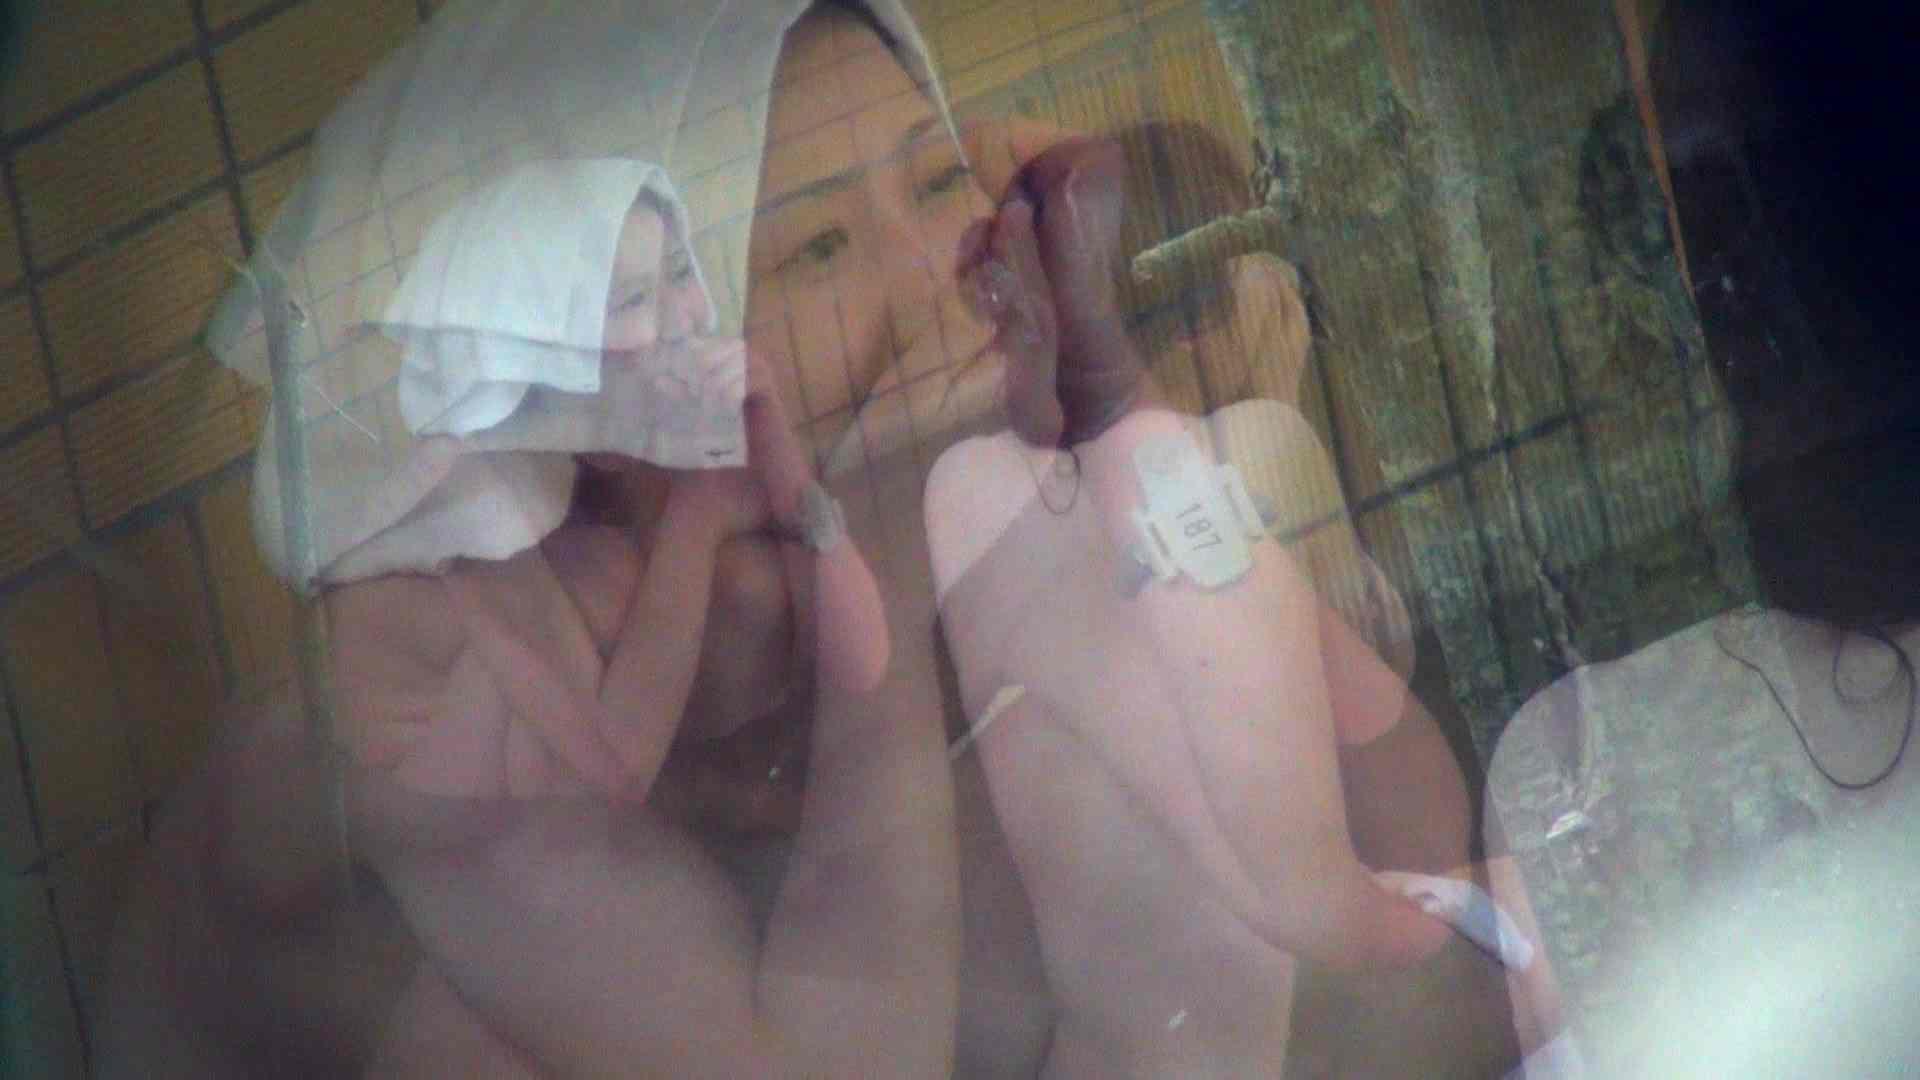 Vol.44 アラサー三人露天風呂女子会開催中 お姉さん攻略 ワレメ無修正動画無料 112画像 75